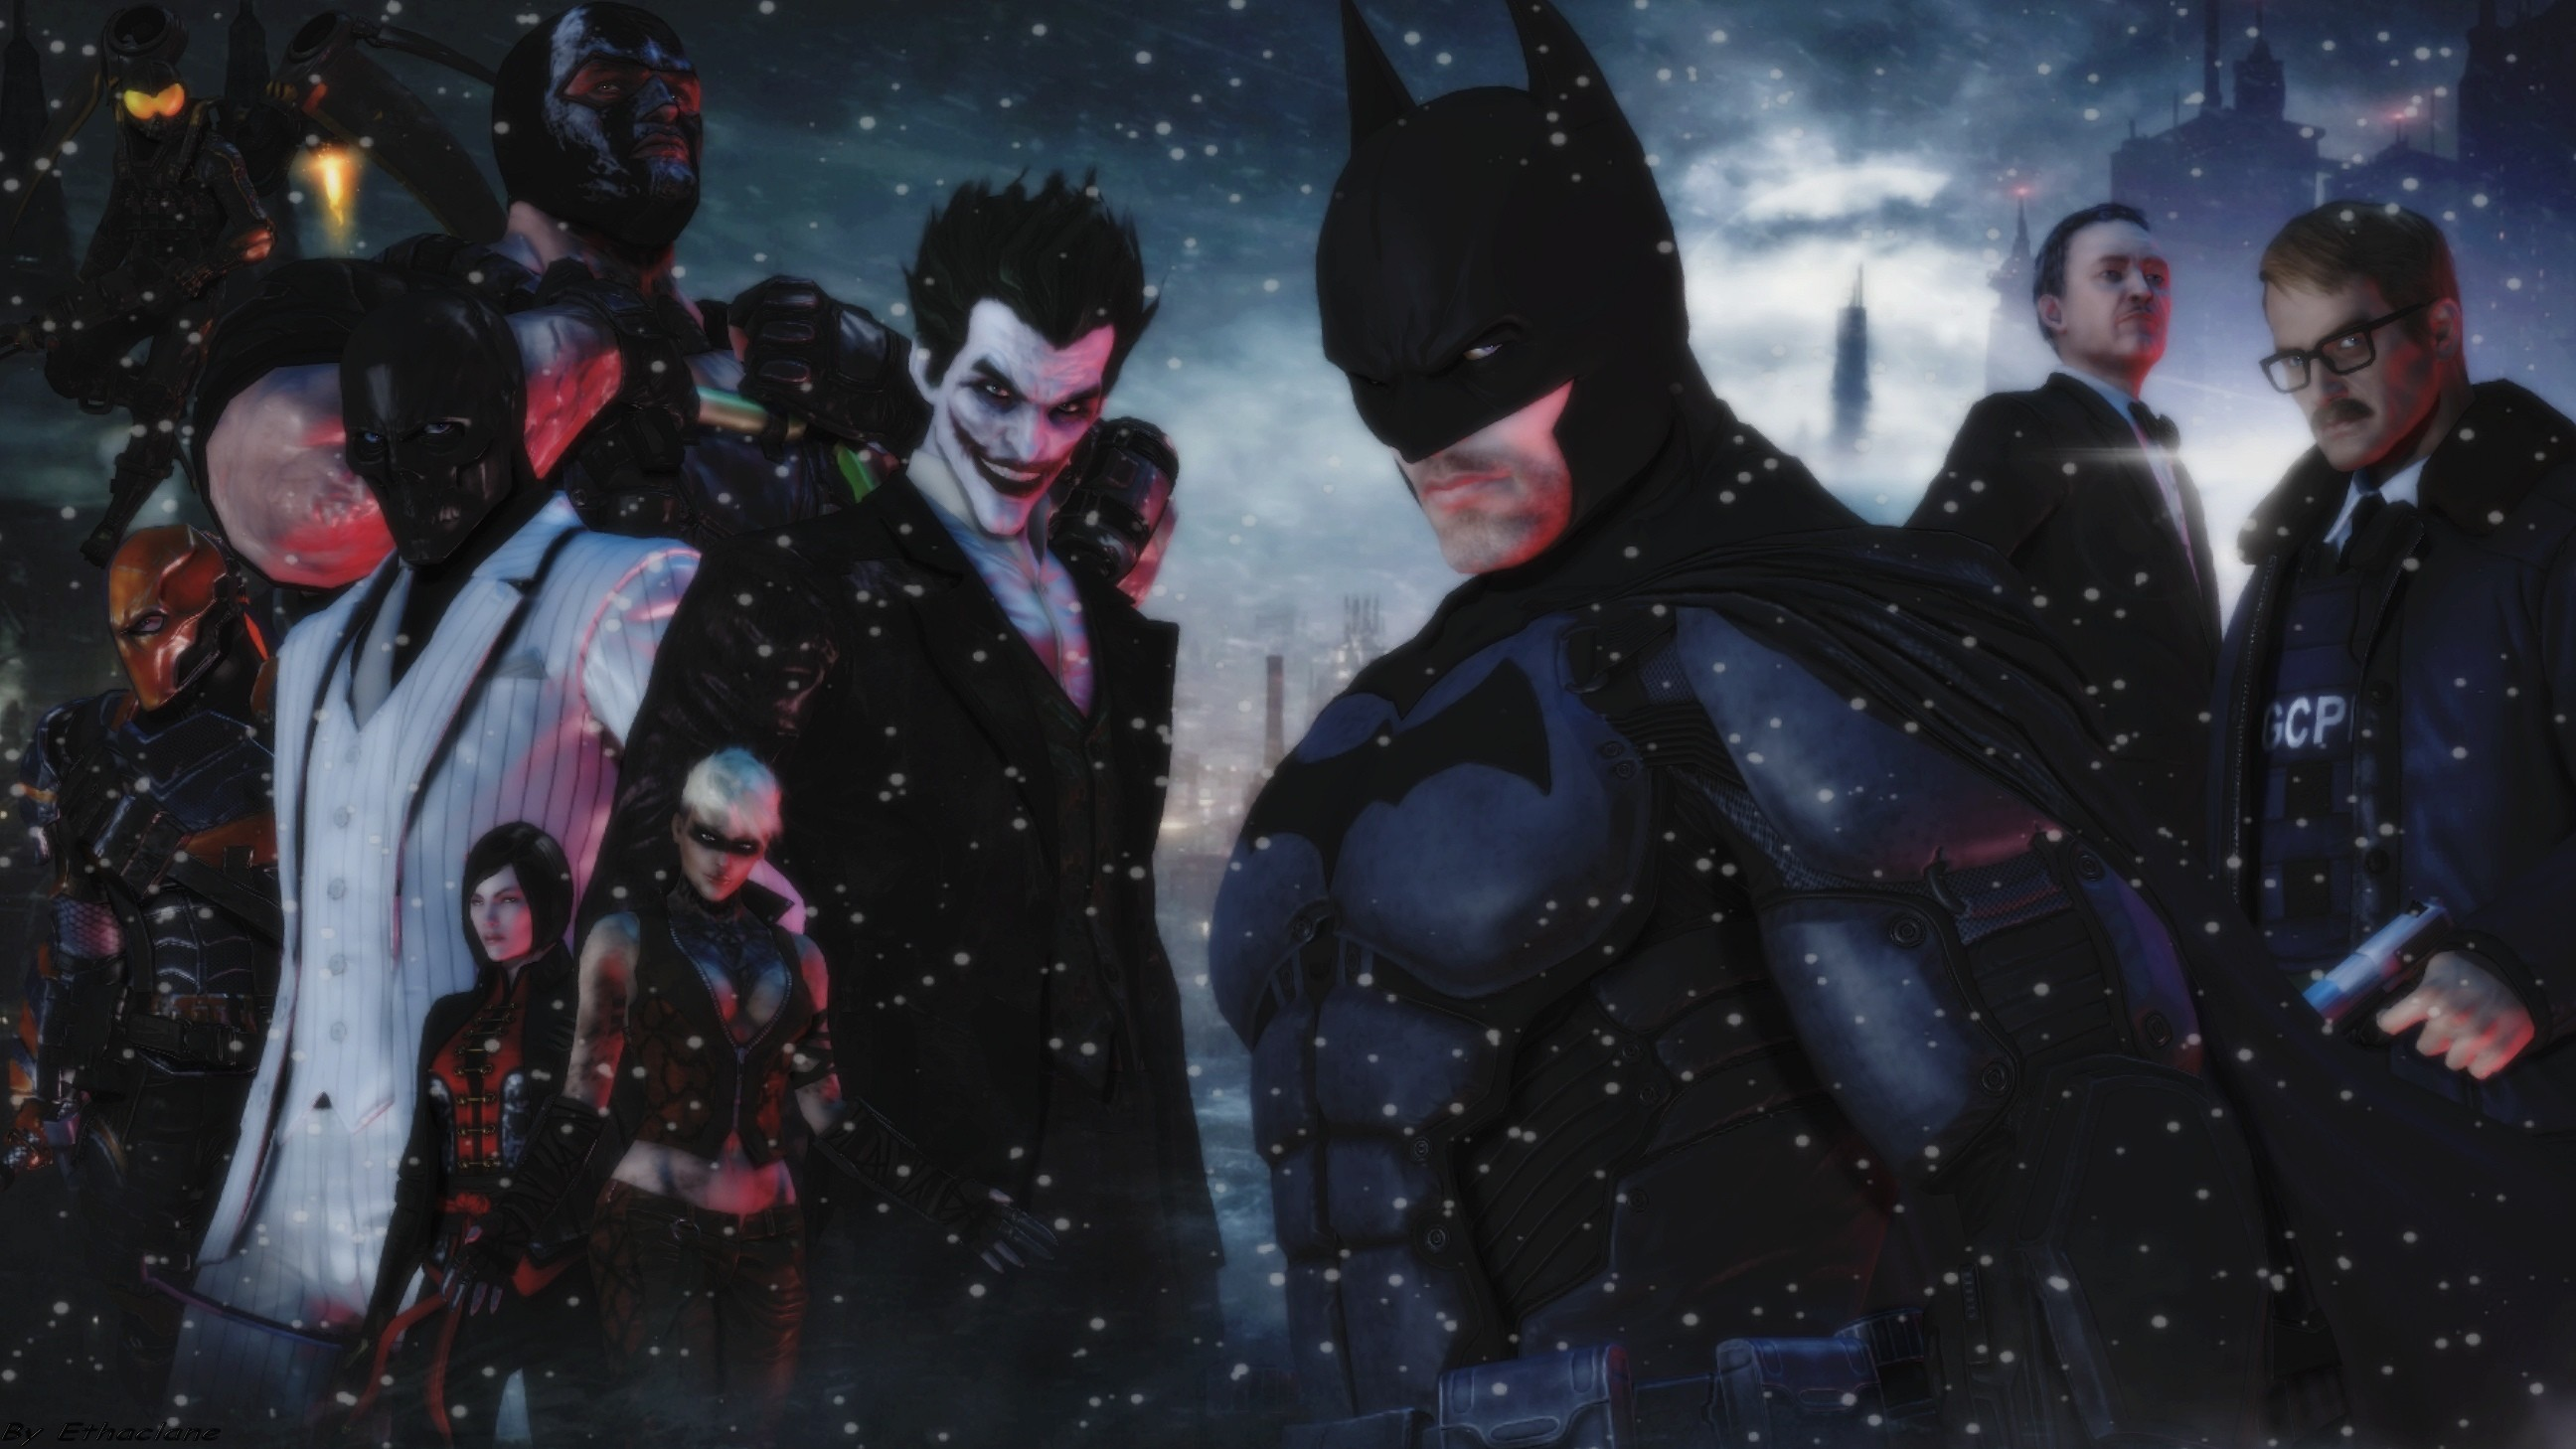 Batman Arkham origins wallpaper by ethaclane Batman Arkham origins wallpaper  by ethaclane